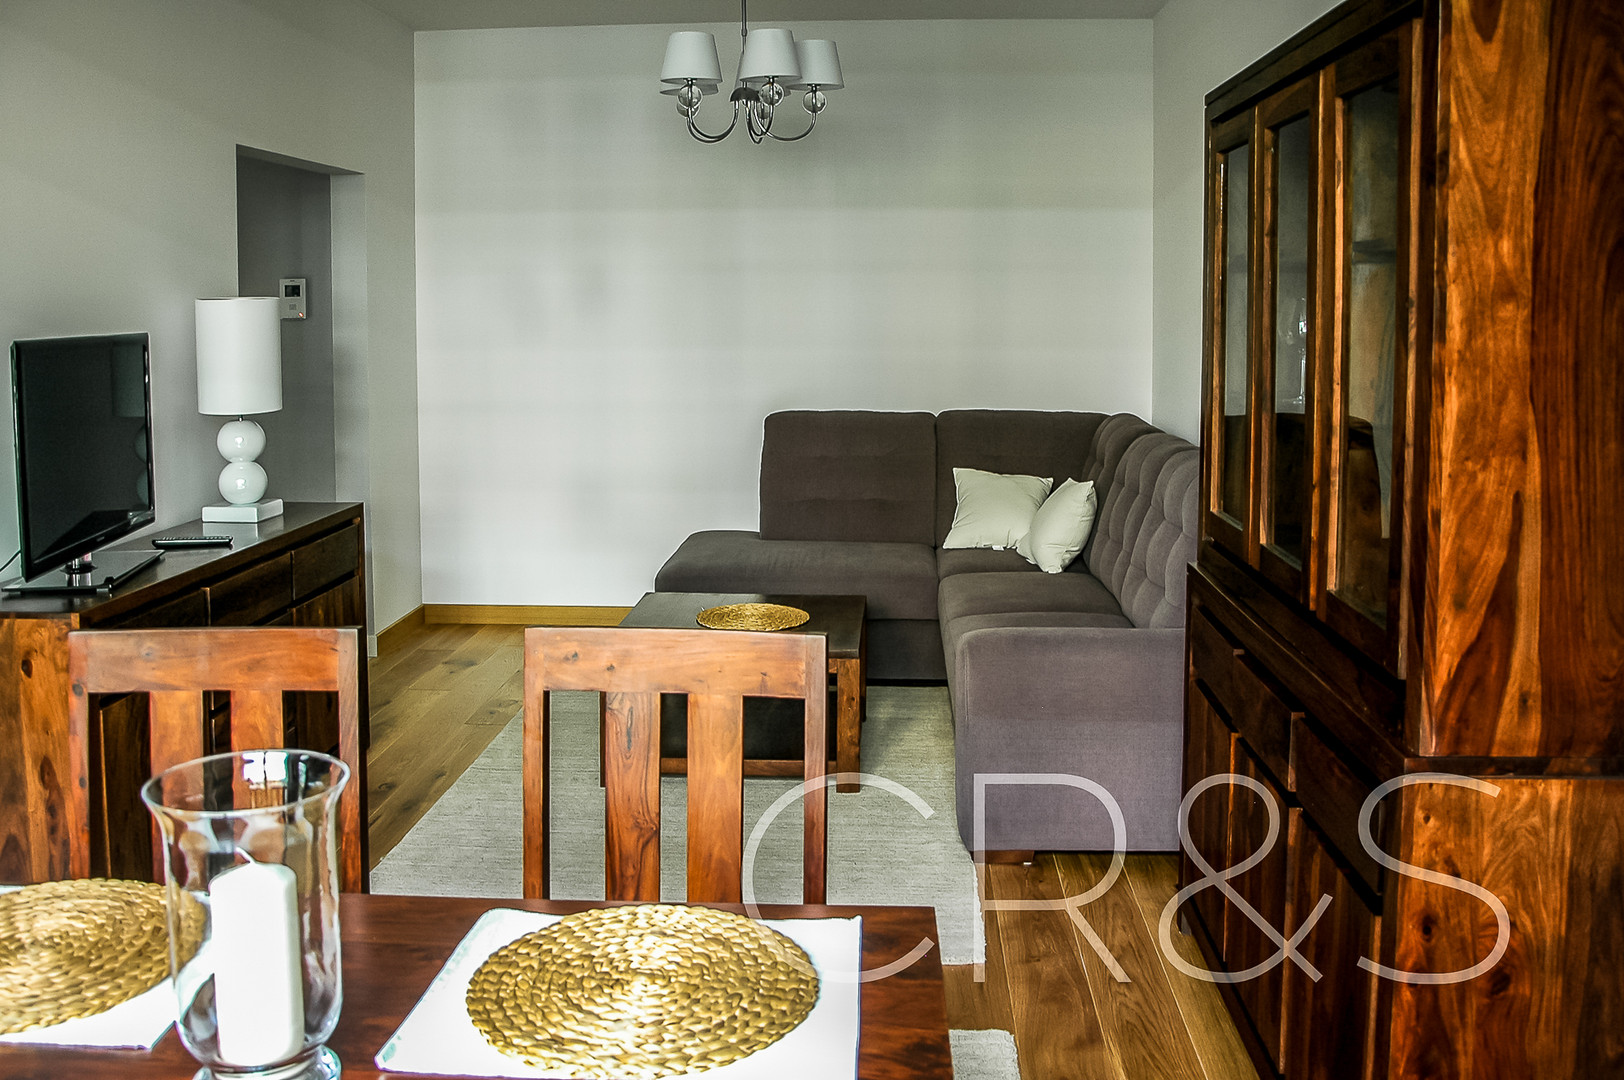 Apartments for rent Kolejowa Warsaw_0881